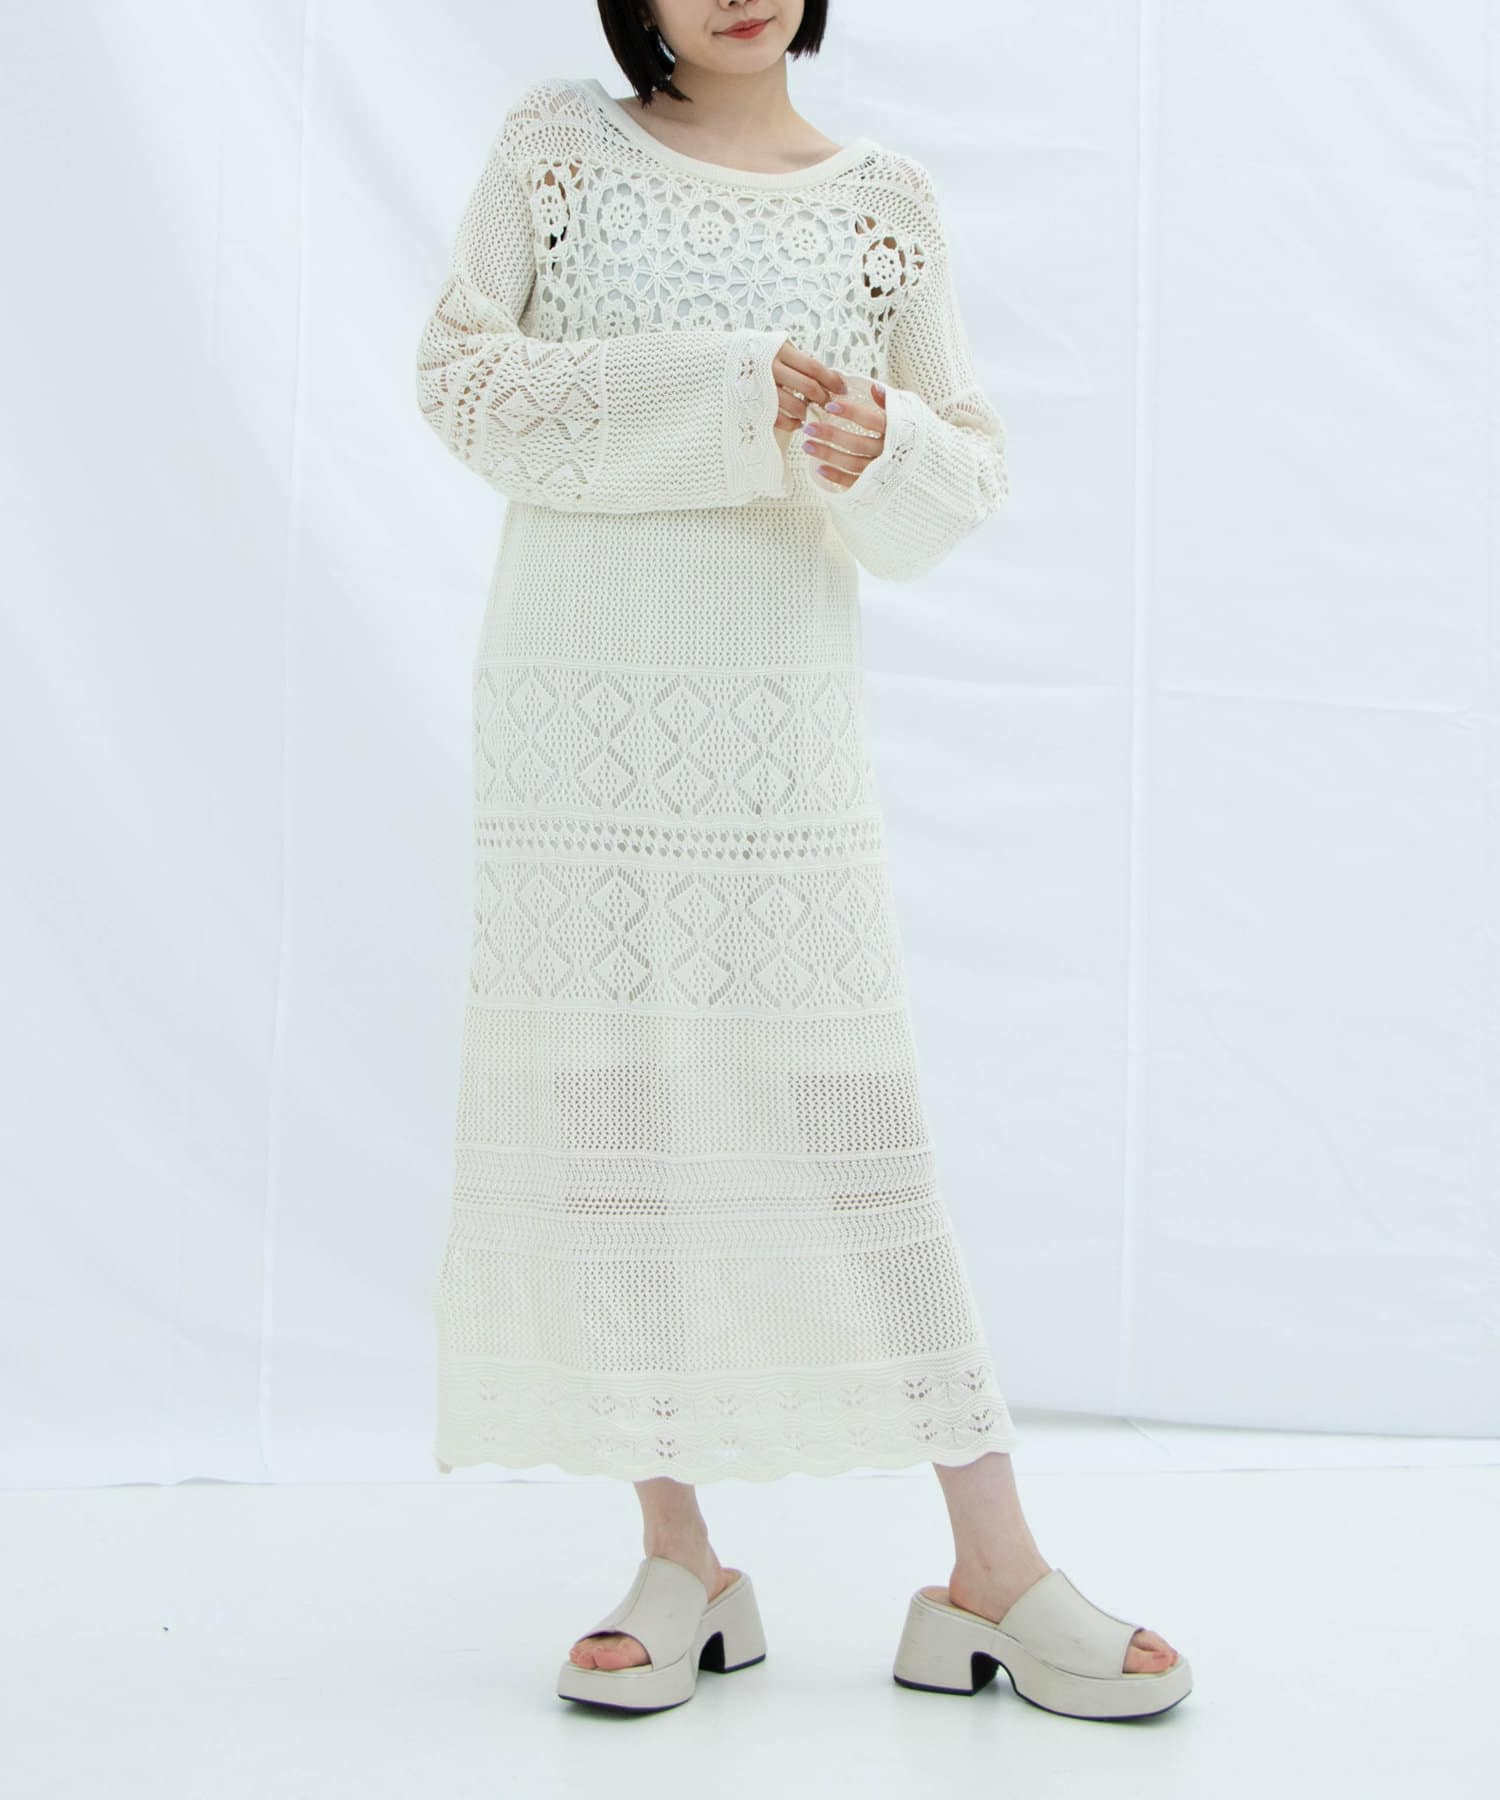 Kastane(カスタネ) かぎ針パッチワーク編みワンピース 【動画あり】